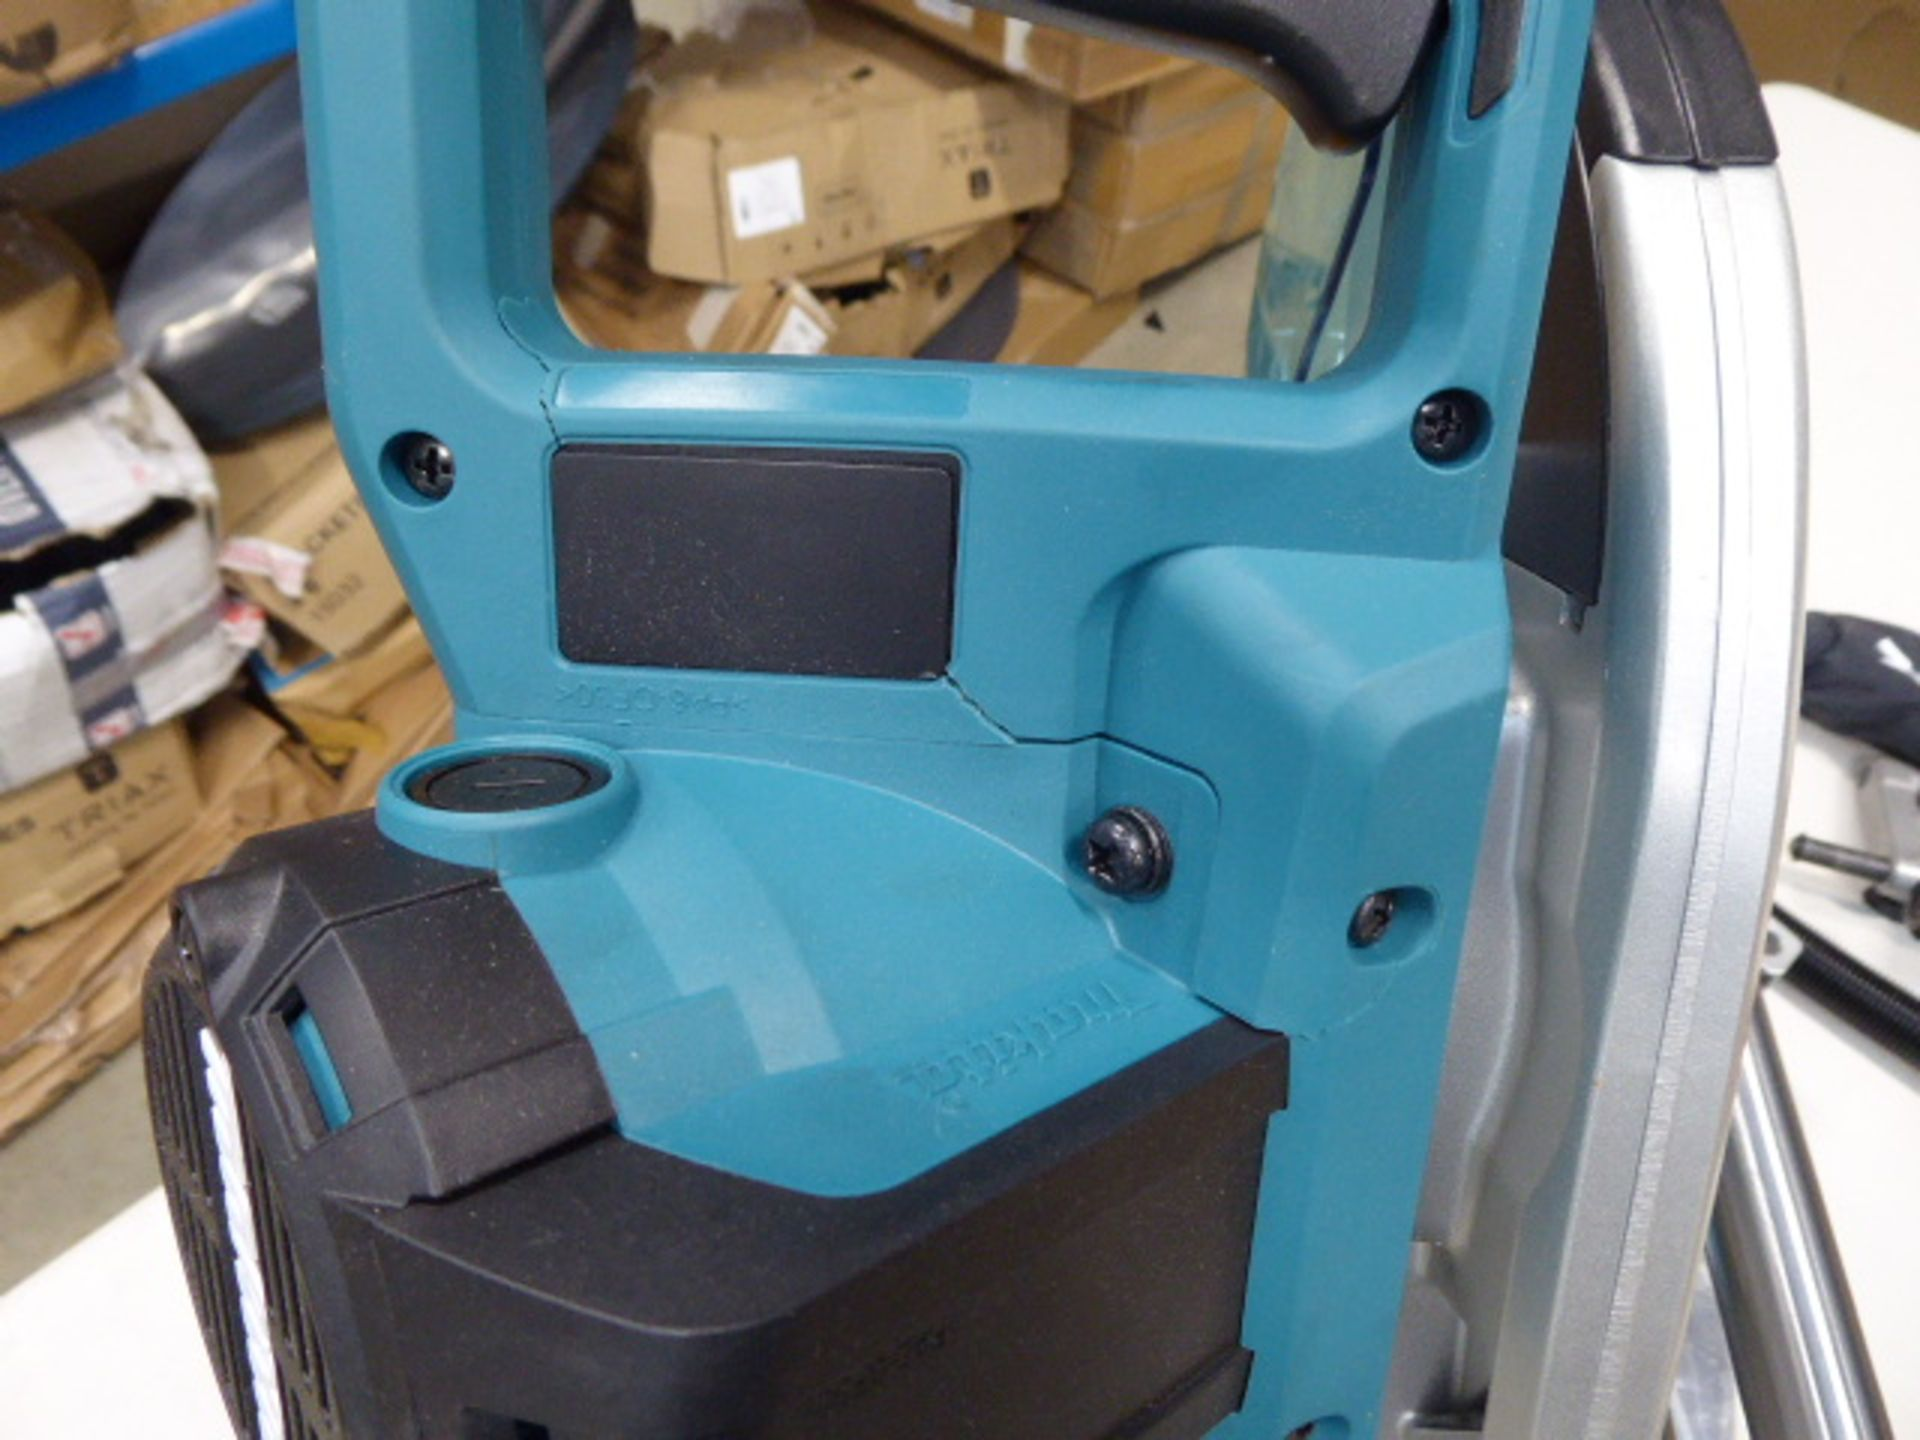 Makita 305mm slide compound mitre saw - Image 5 of 7